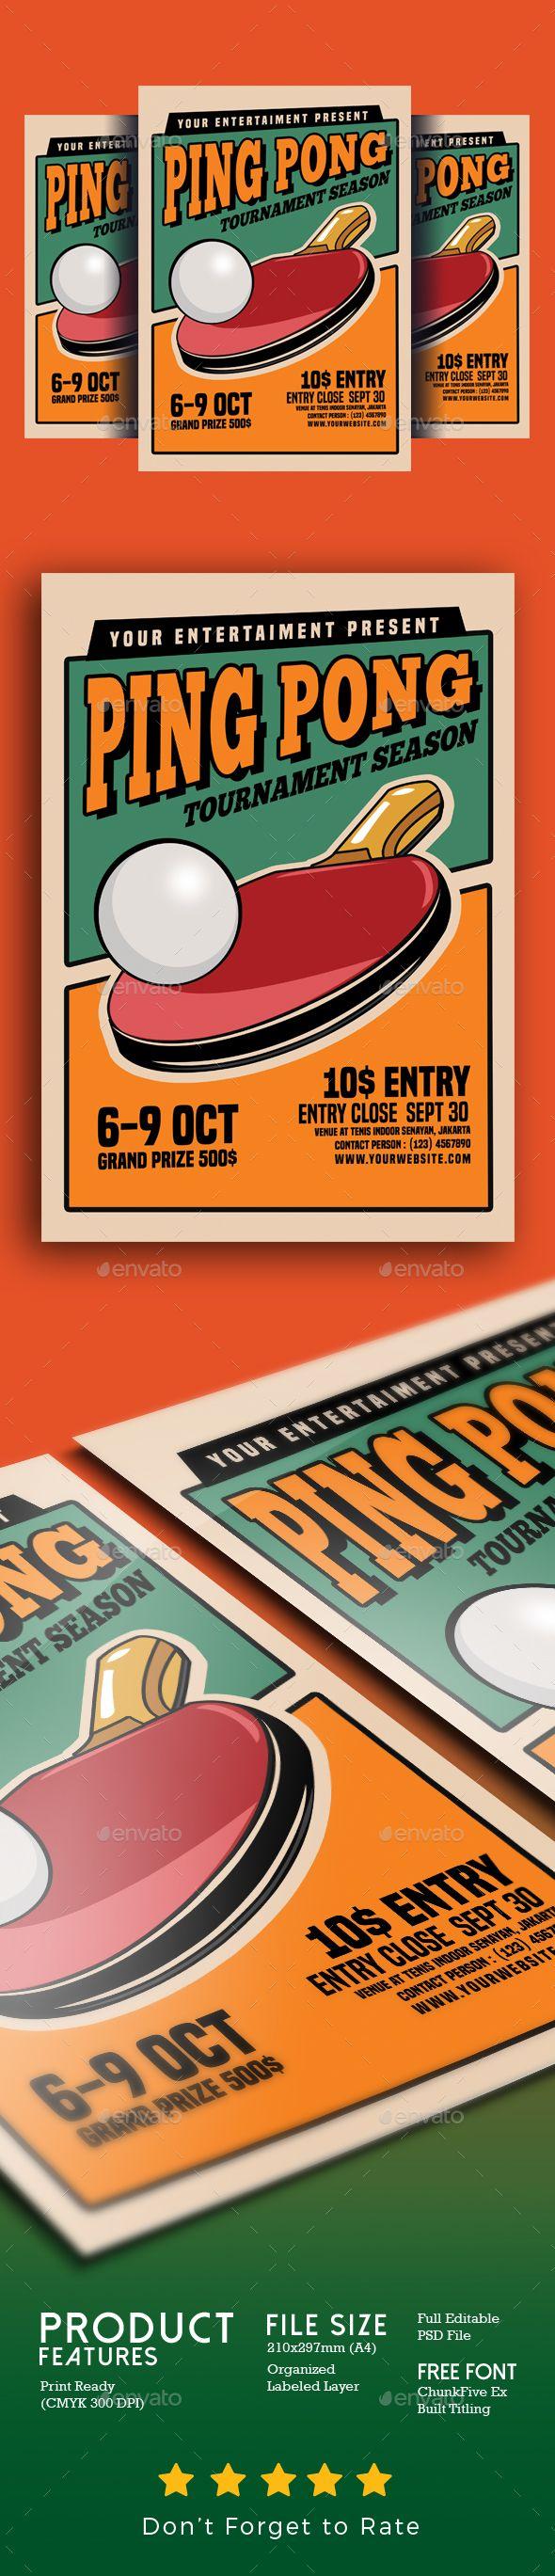 Ping Pong Tournament Flyer Template PSD | Flyer Templates ...